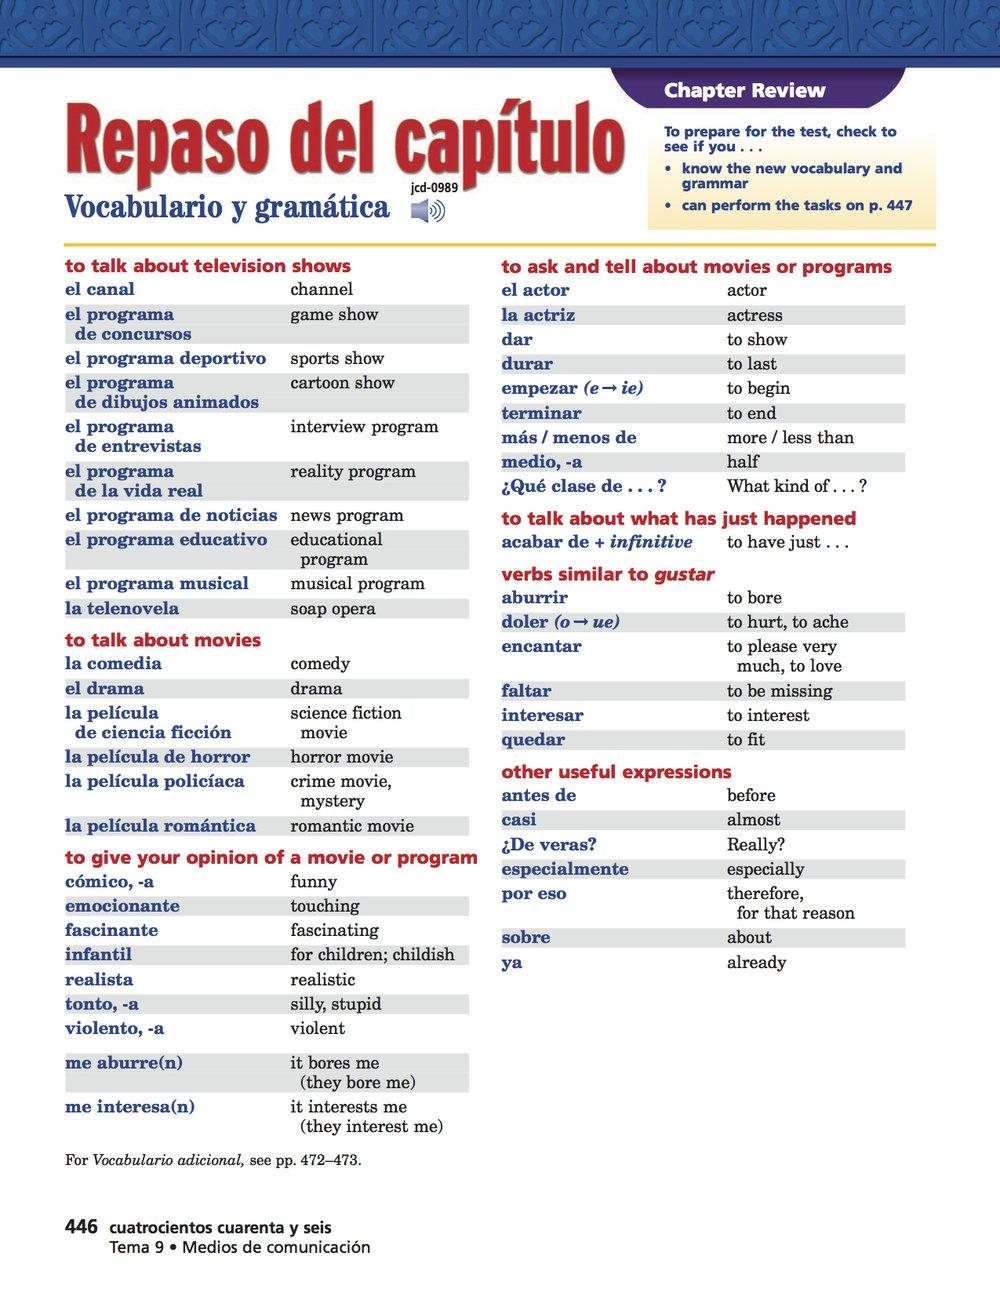 L1_Capitulo_9A copia.jpg